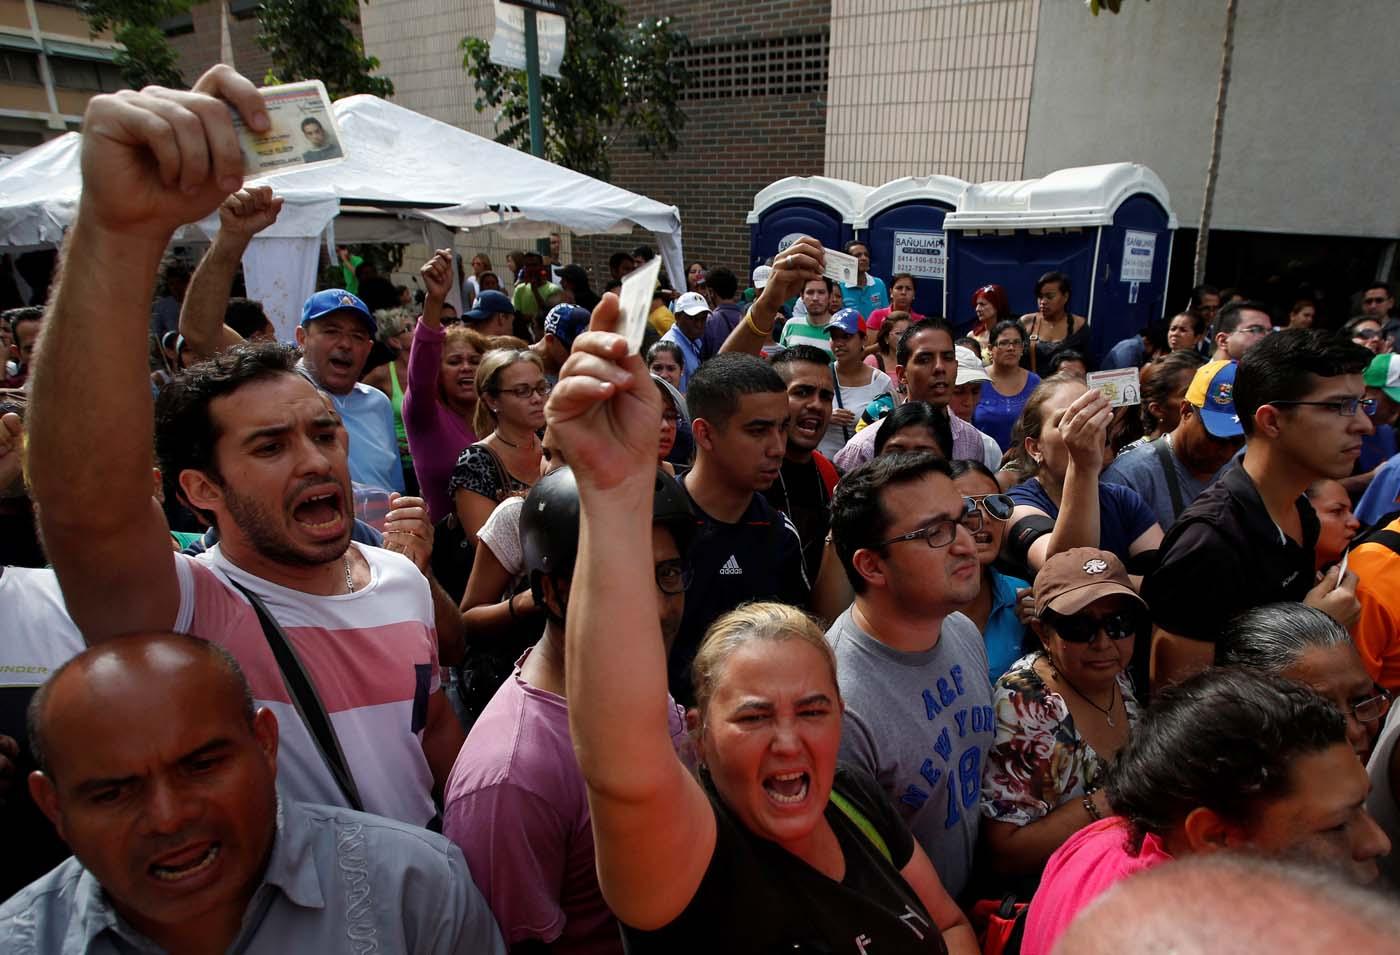 2016-06-24T221937Z_1137672142_S1AETLVCNHAA_RTRMADP_3_VENEZUELA-POLITICS